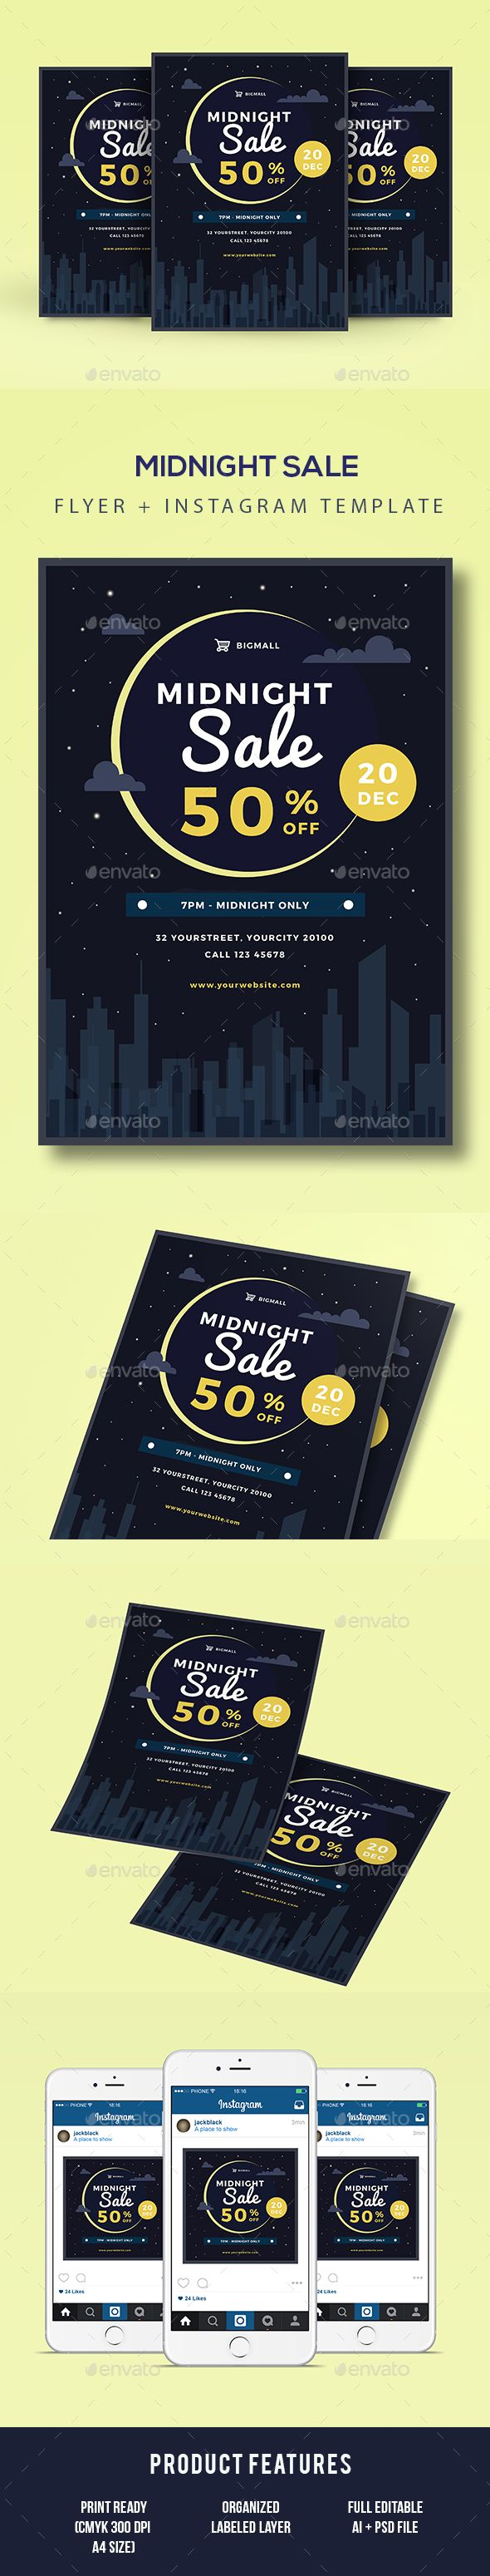 Midnight Sale Flyer Template PSD, AI Illustrator